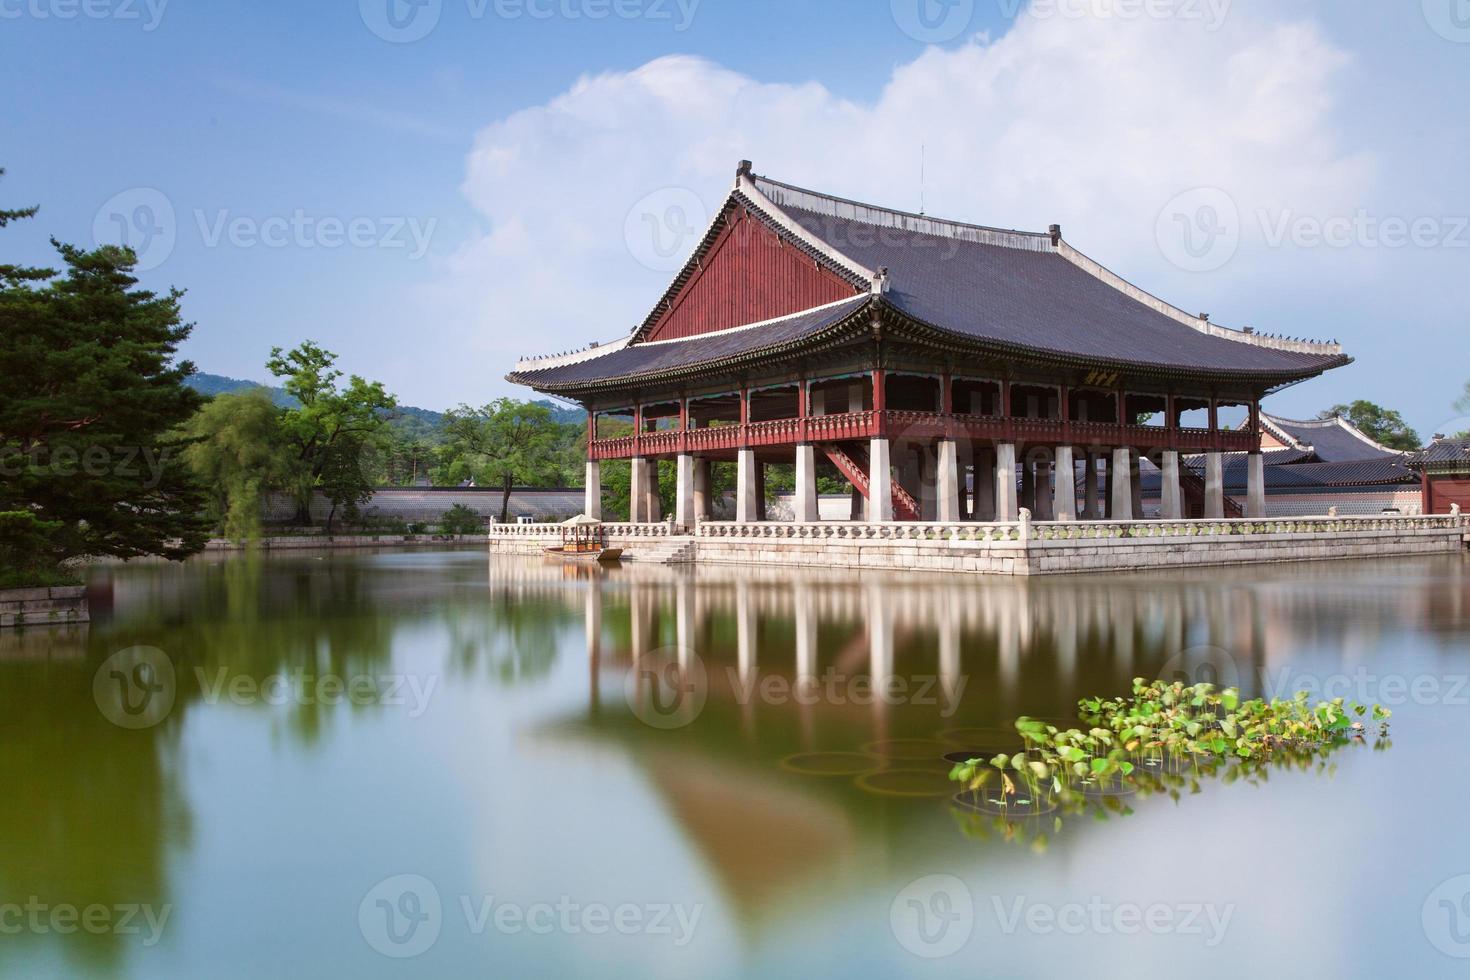 palácio gyeongbokgung, seul, coreia do sul. foto